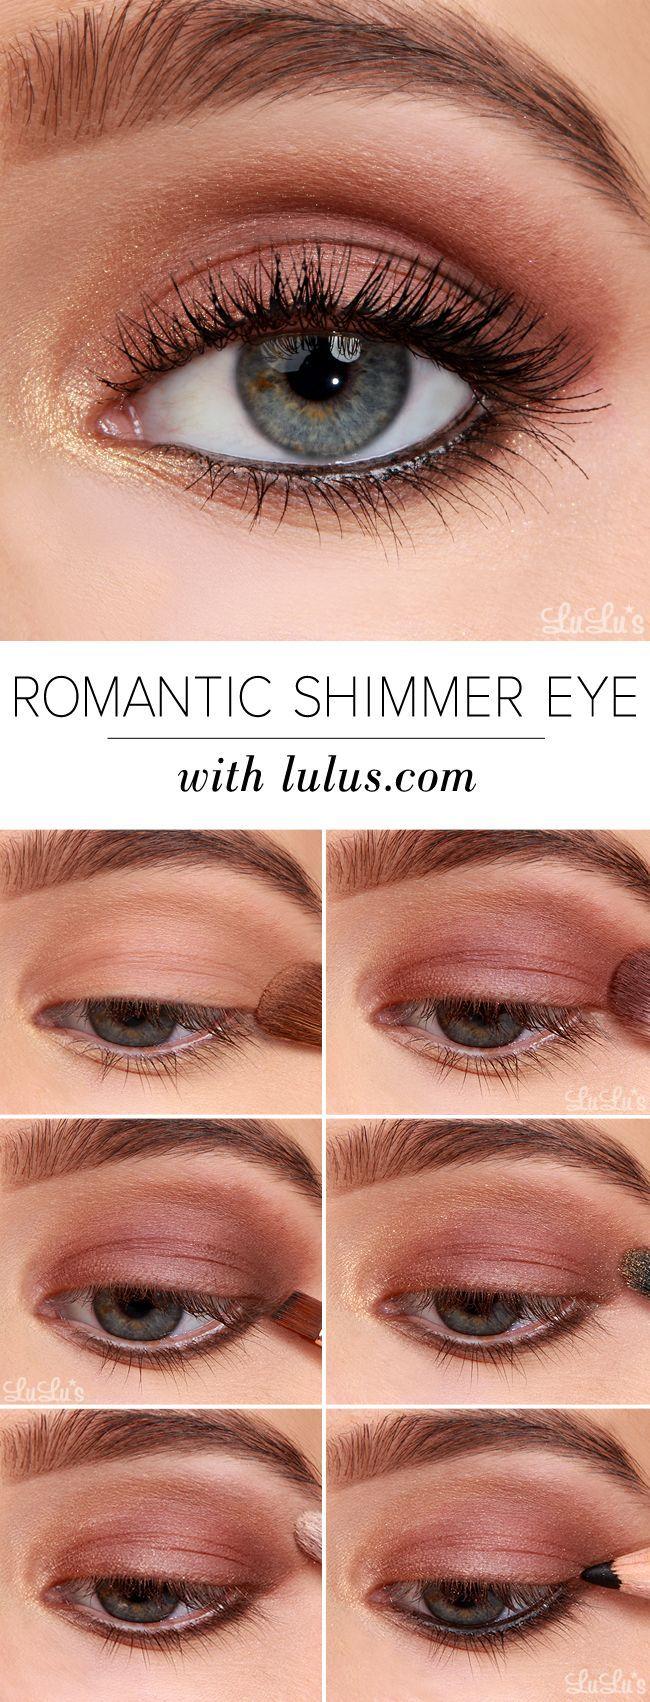 Best 25+ Eyeshadow Tutorials Ideas On Pinterest